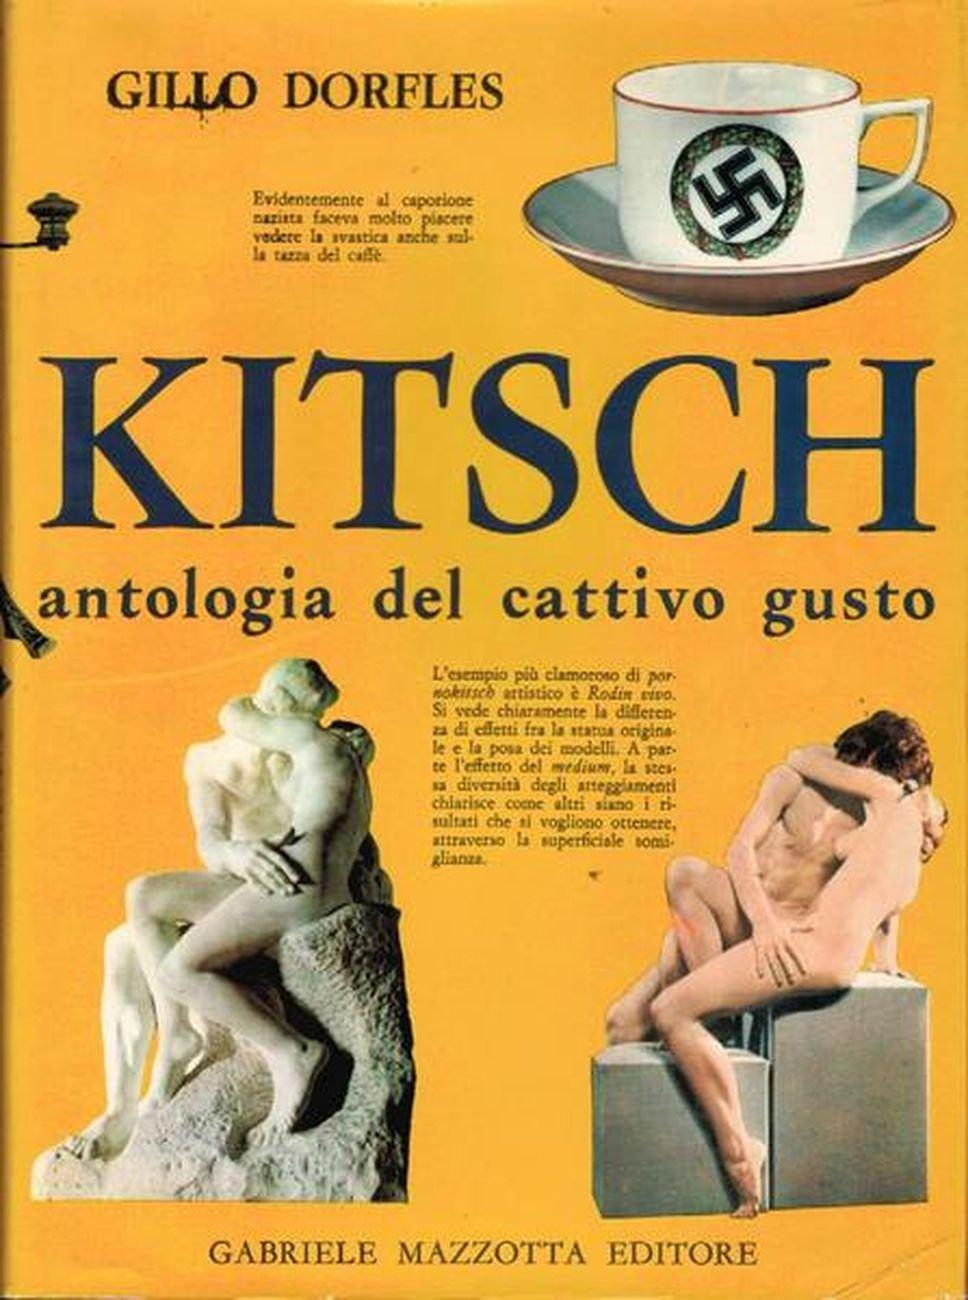 Gillo Dorfles, Kitsch. Antologia del cattivo gusto (Mazzotta, Milano 1968)